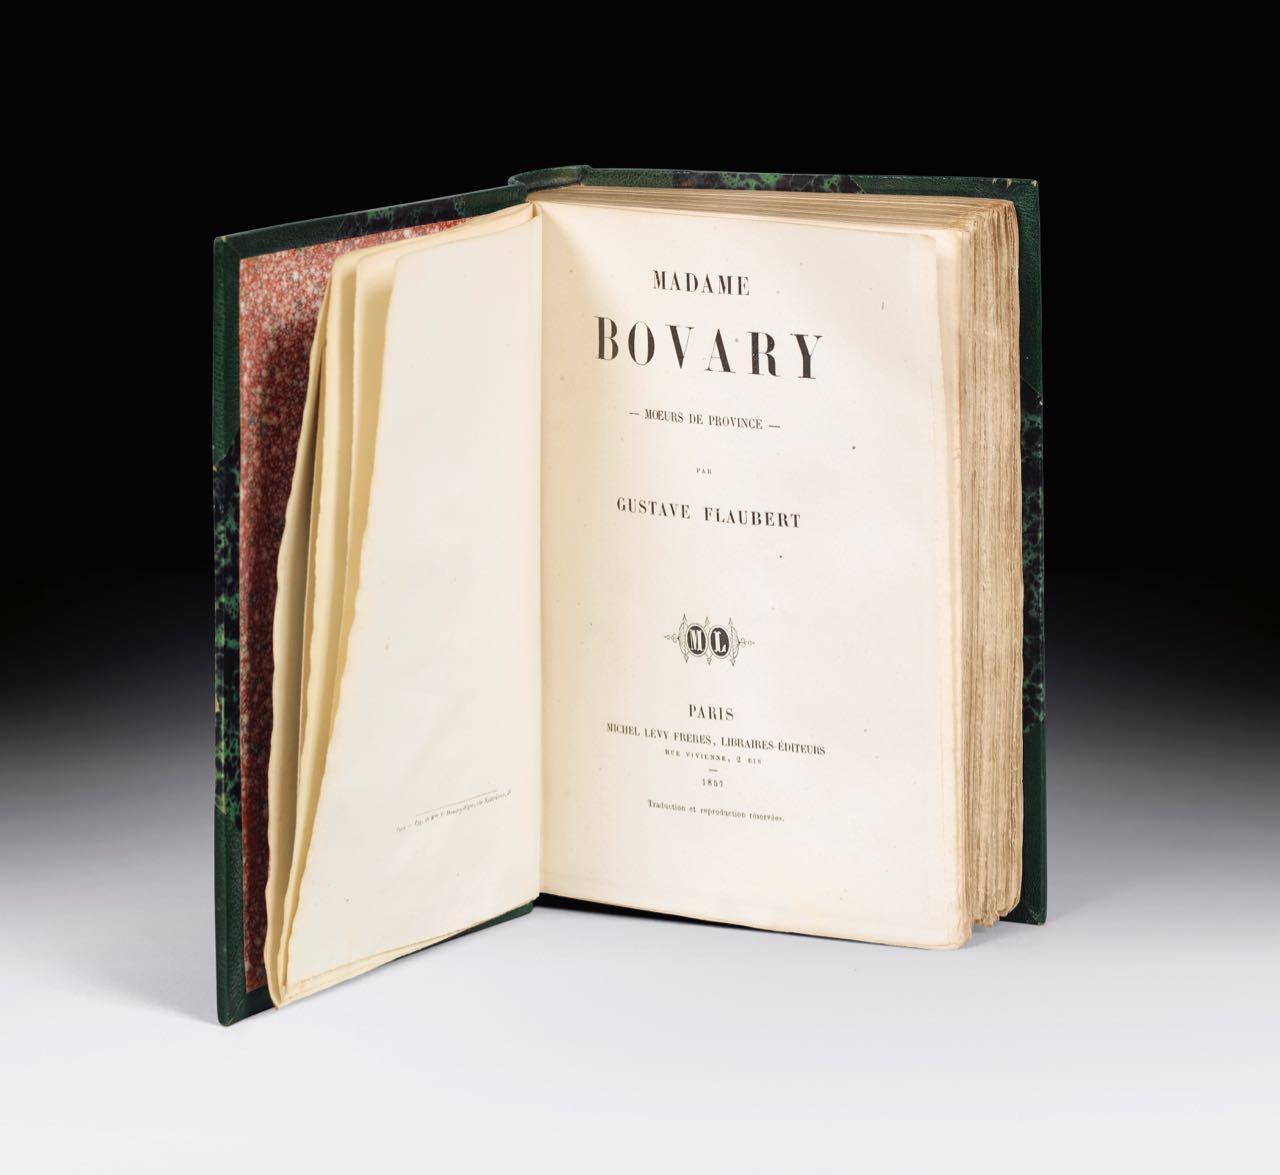 Gustave FLAUBERT. Madame Bovary